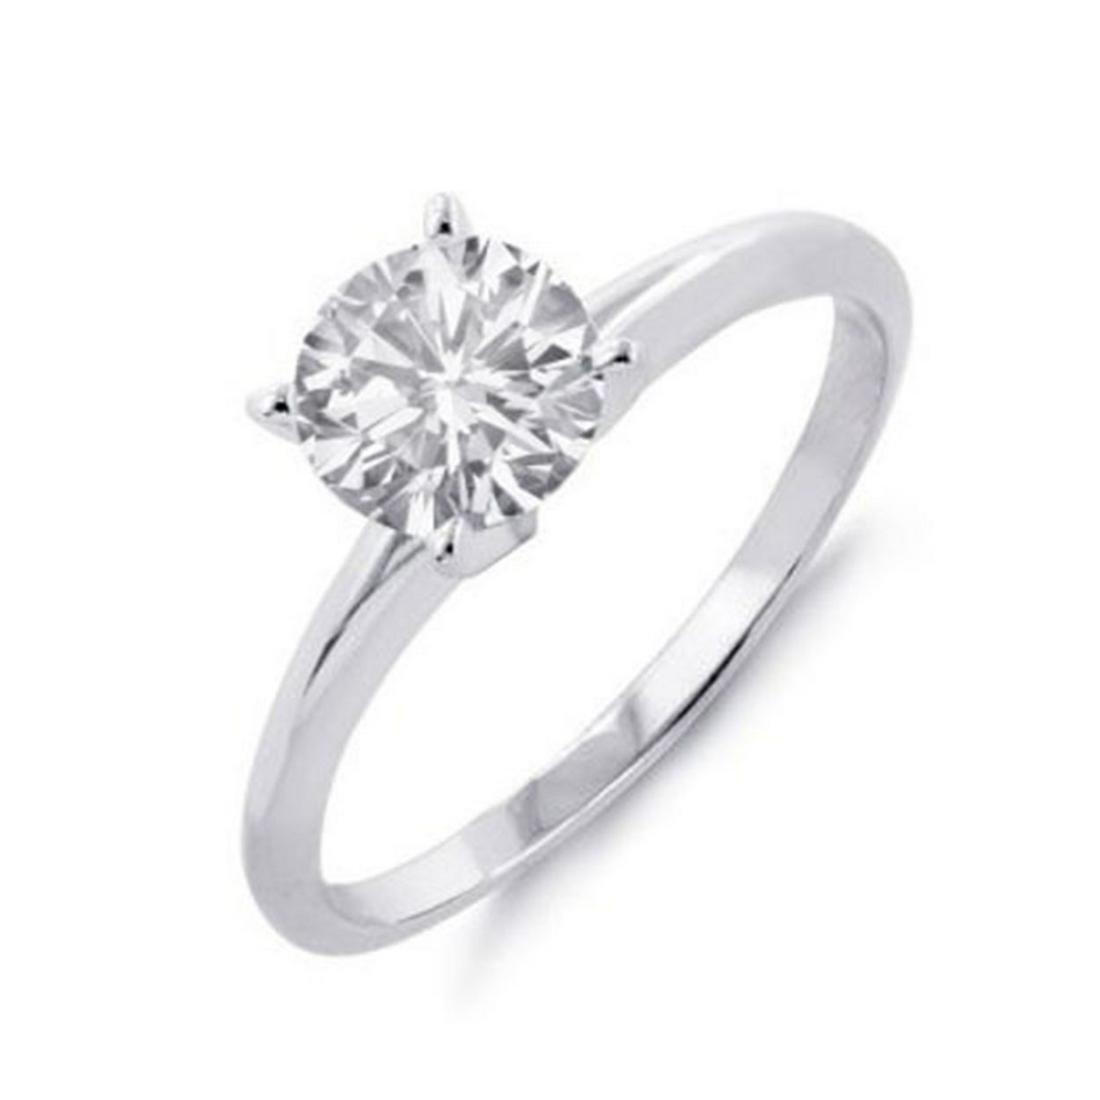 1.35 ctw VS/SI Diamond Solitaire Ring 18K White Gold